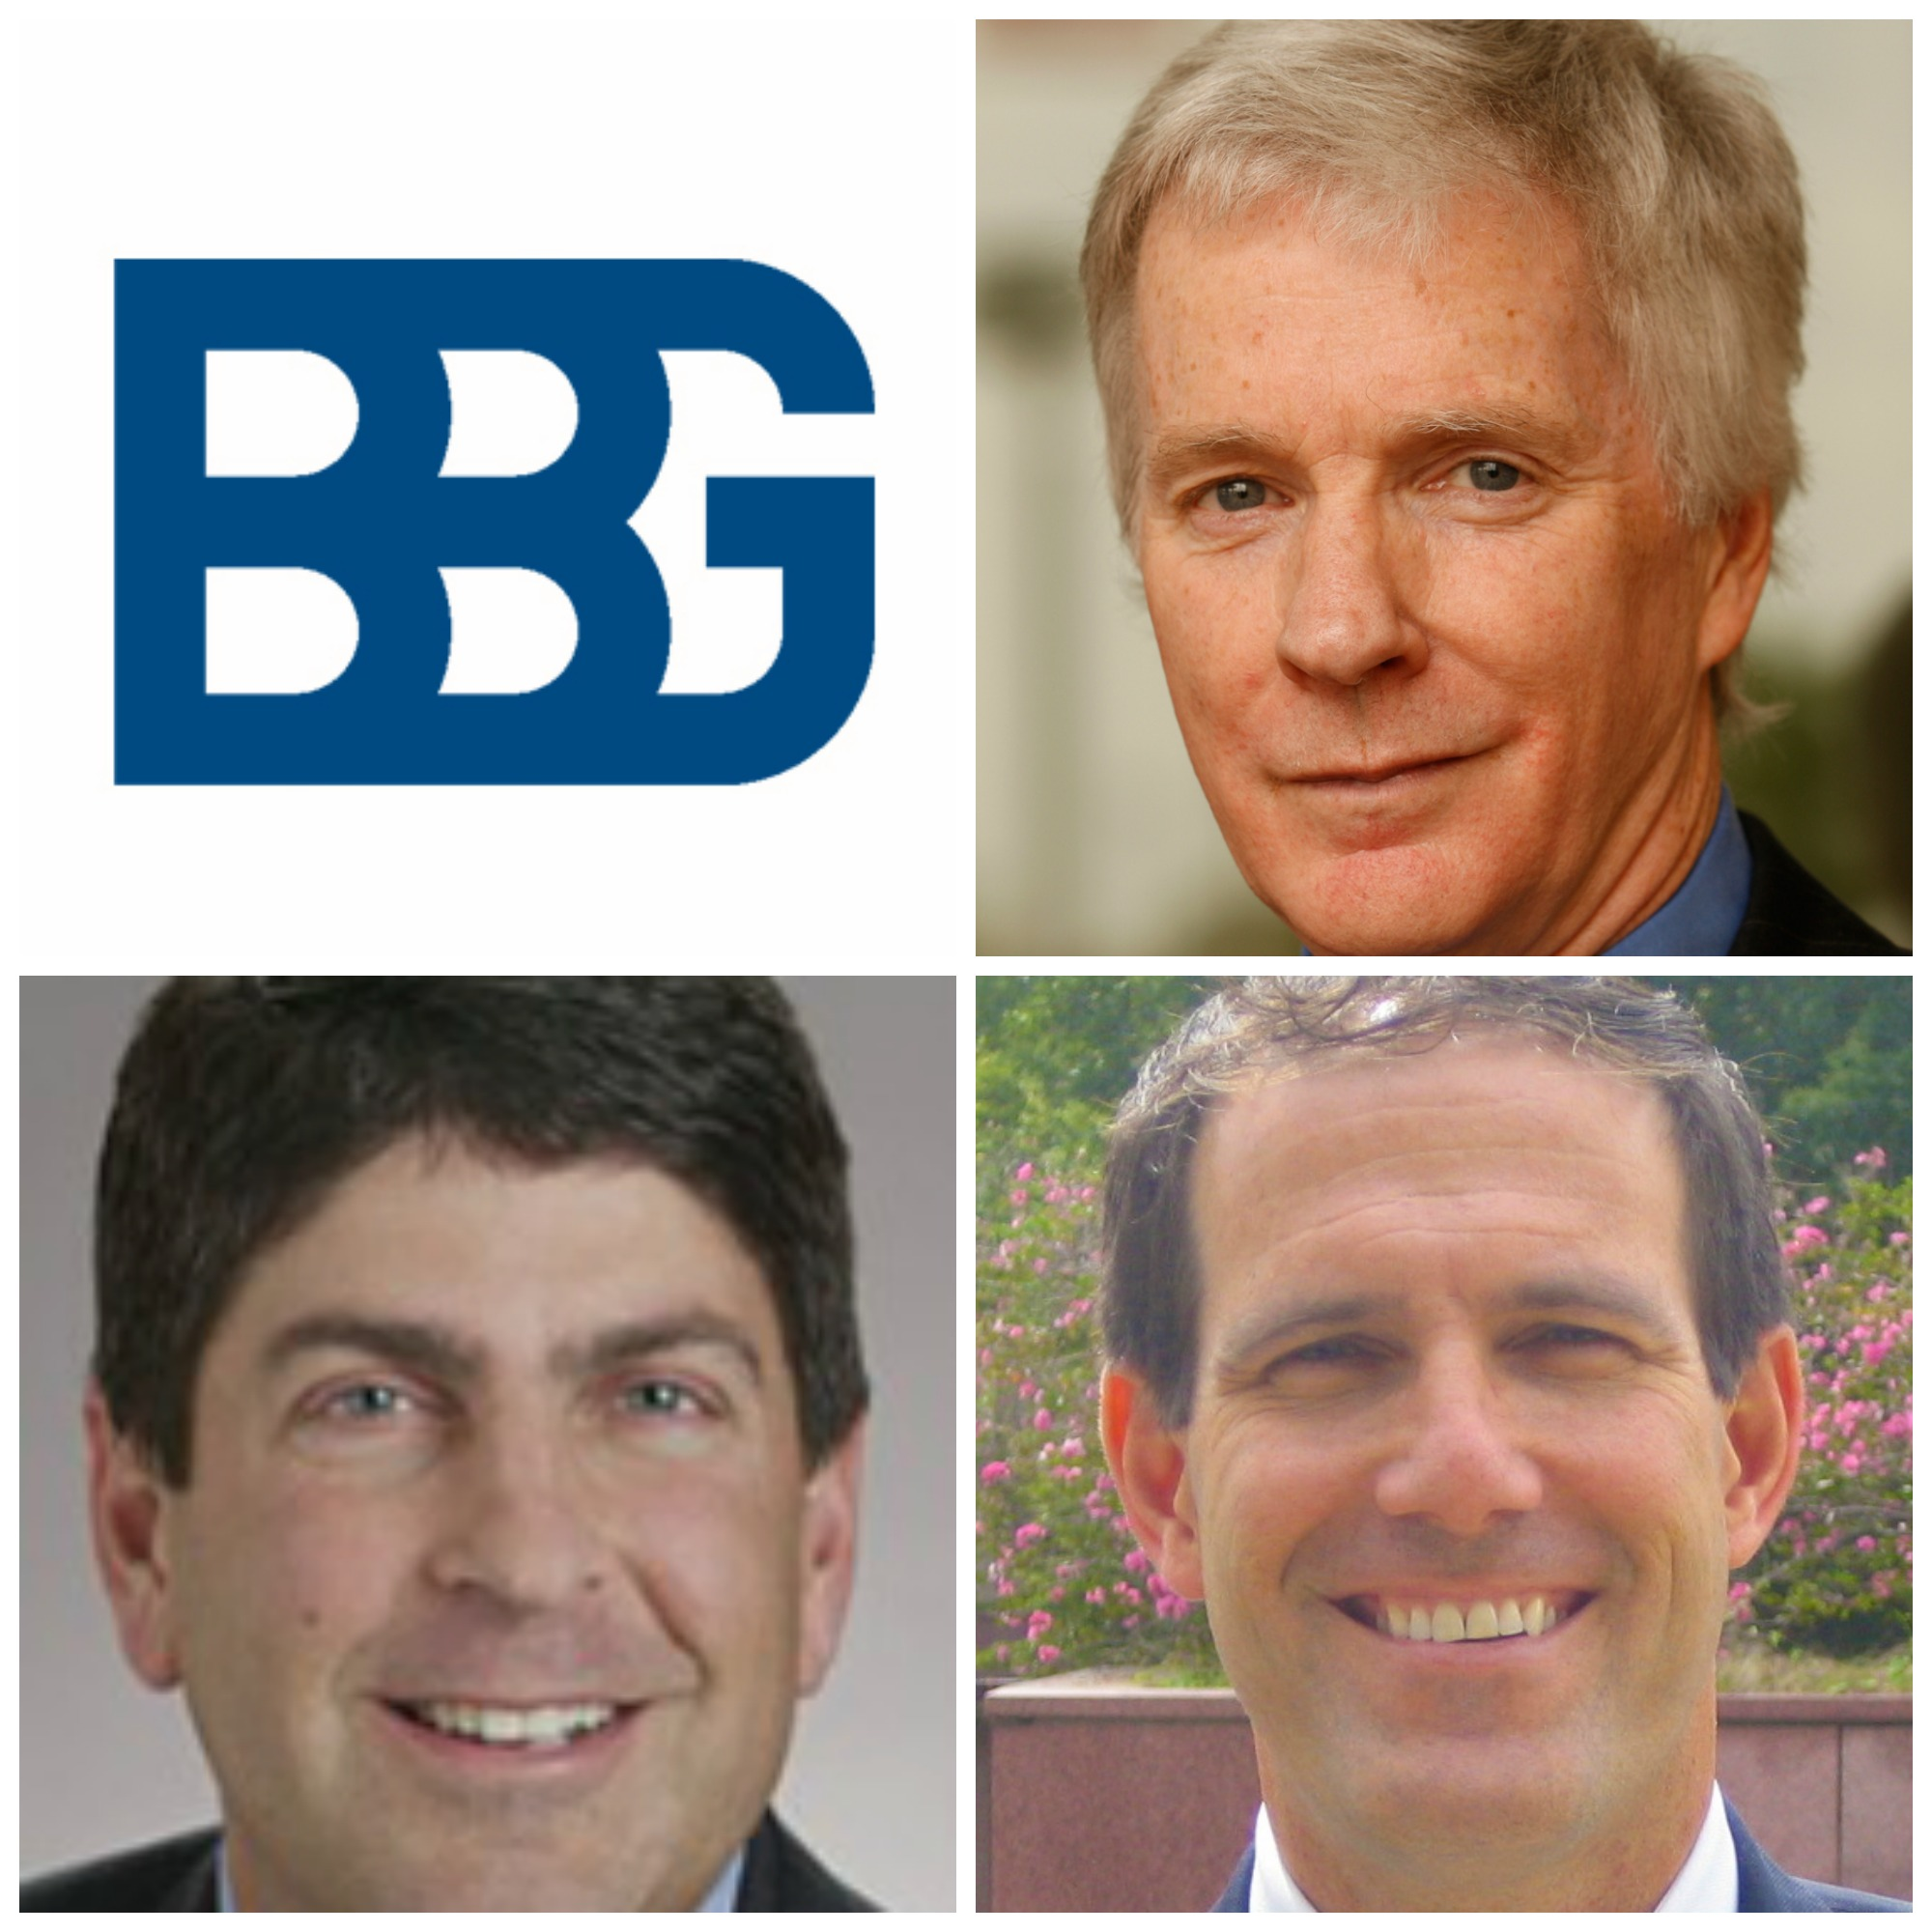 Senate Confirms Three New Members for the BBG Board